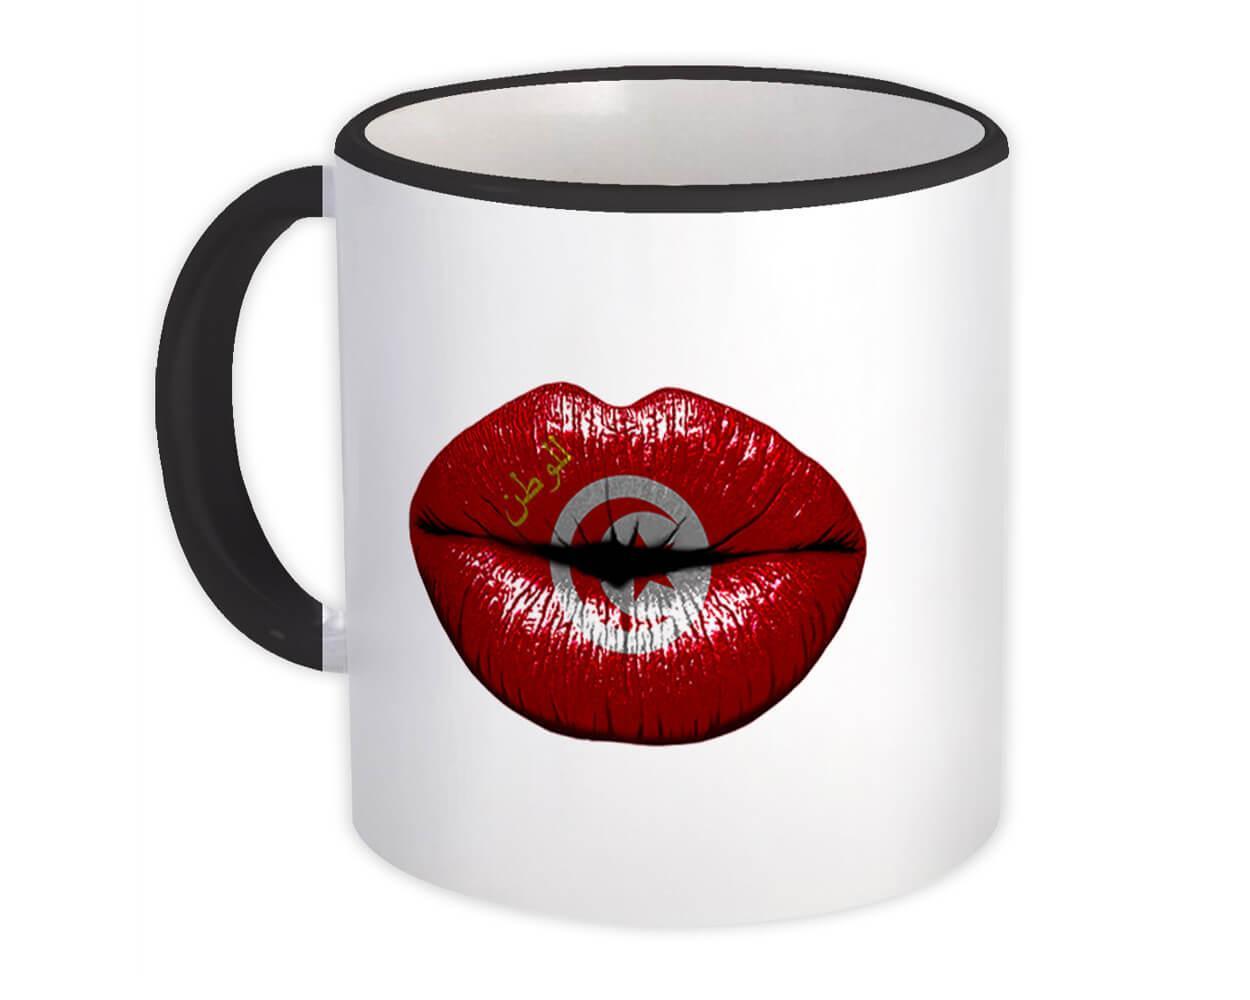 Lips Tunisian Flag : Gift Mug Tunisia Expat Country For Her Woman Feminine Women Sexy Flags Lipstick